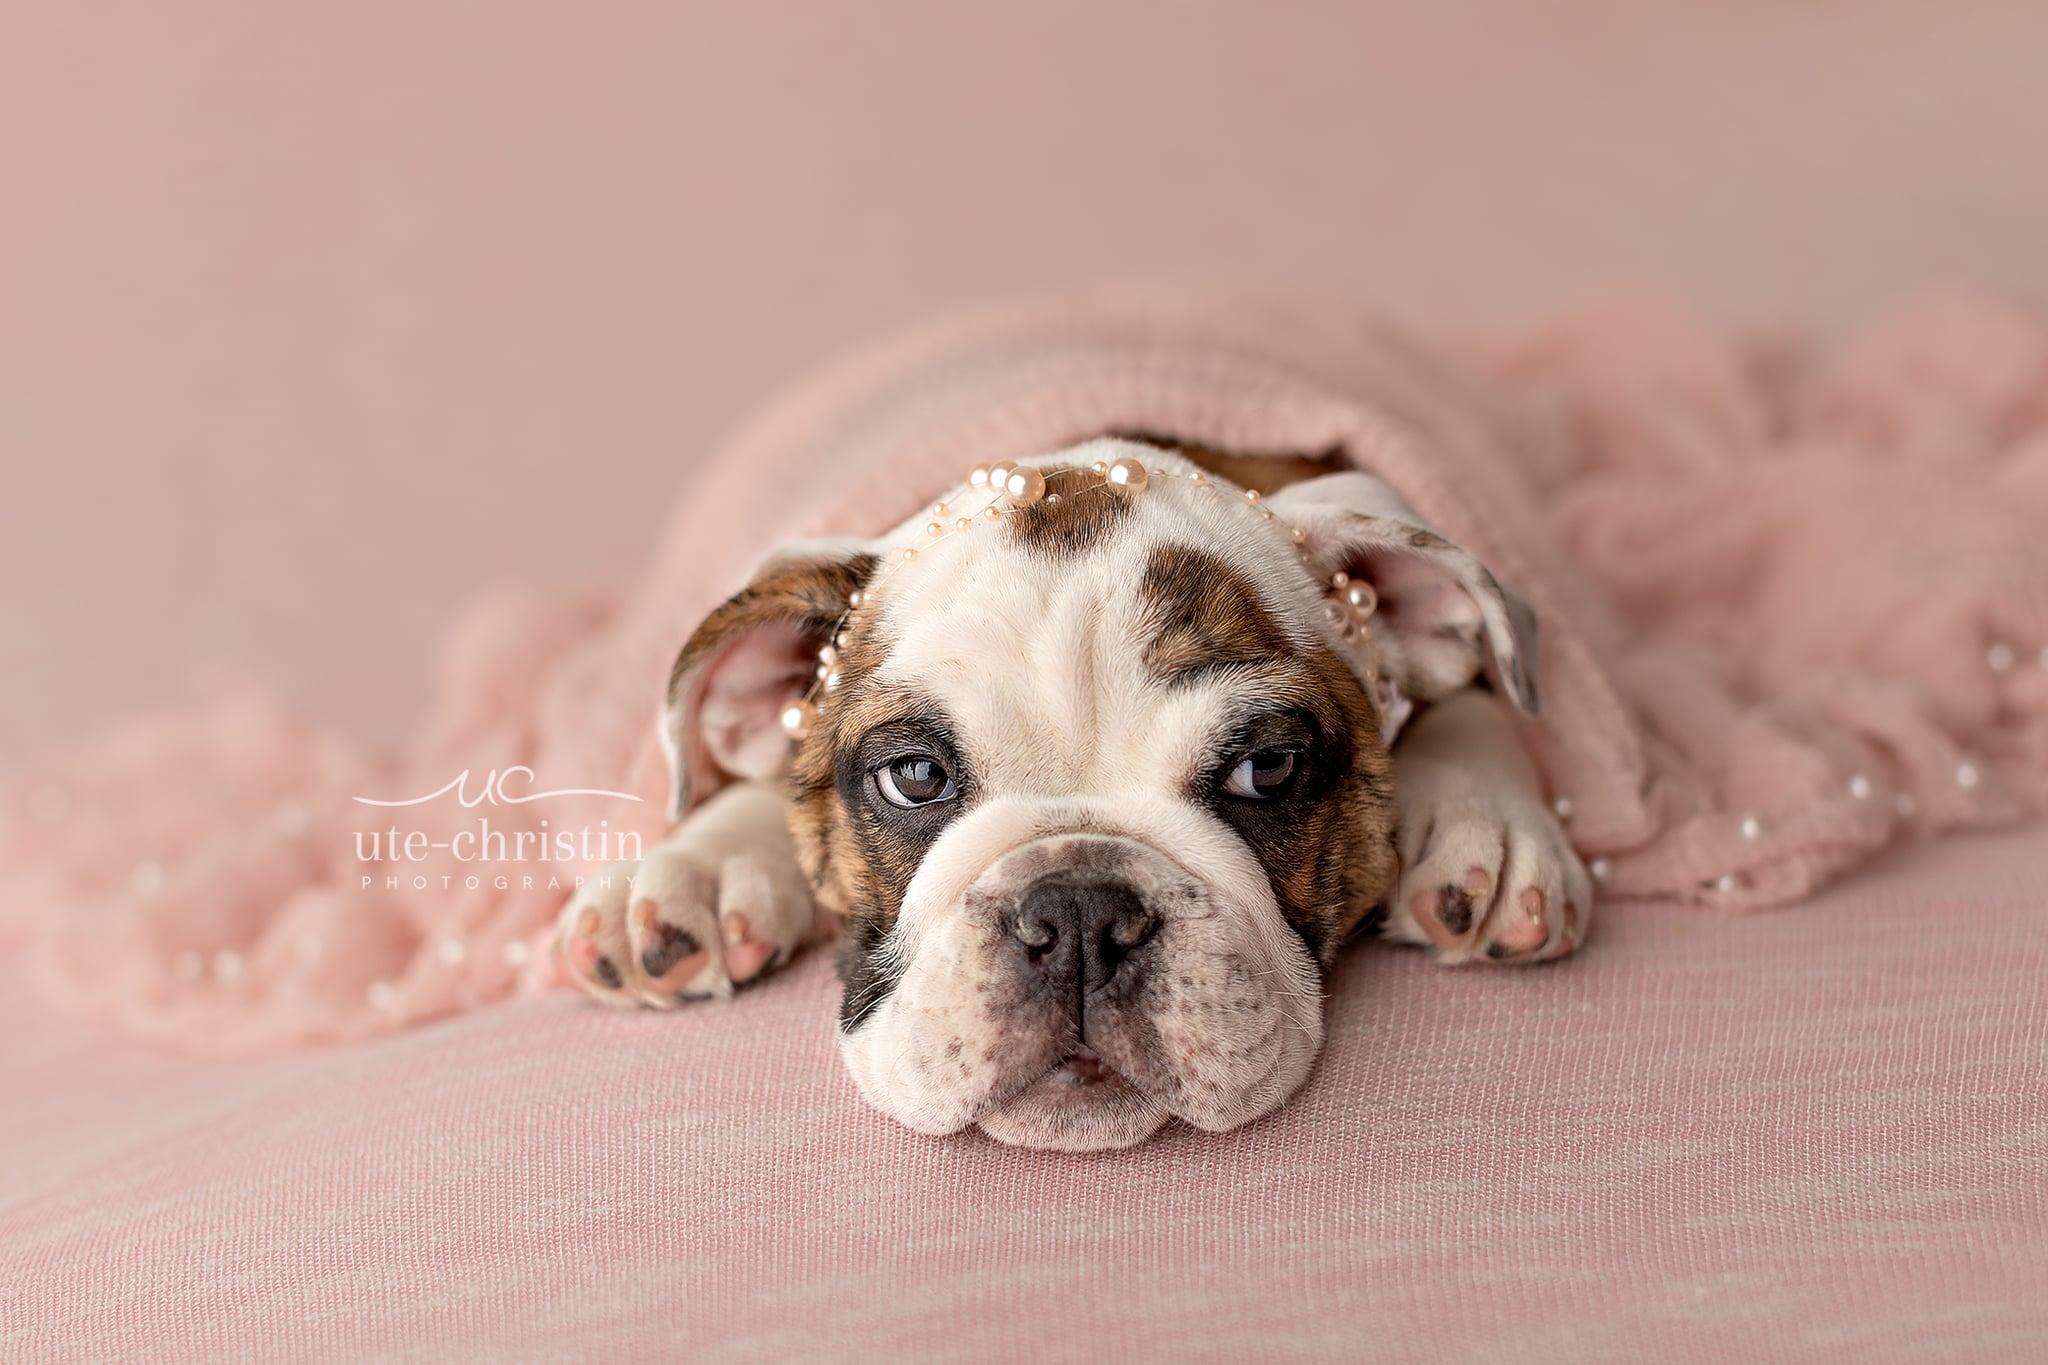 Newborn English Bulldog Puppy Photos For Valentine S Day Popsugar Pets